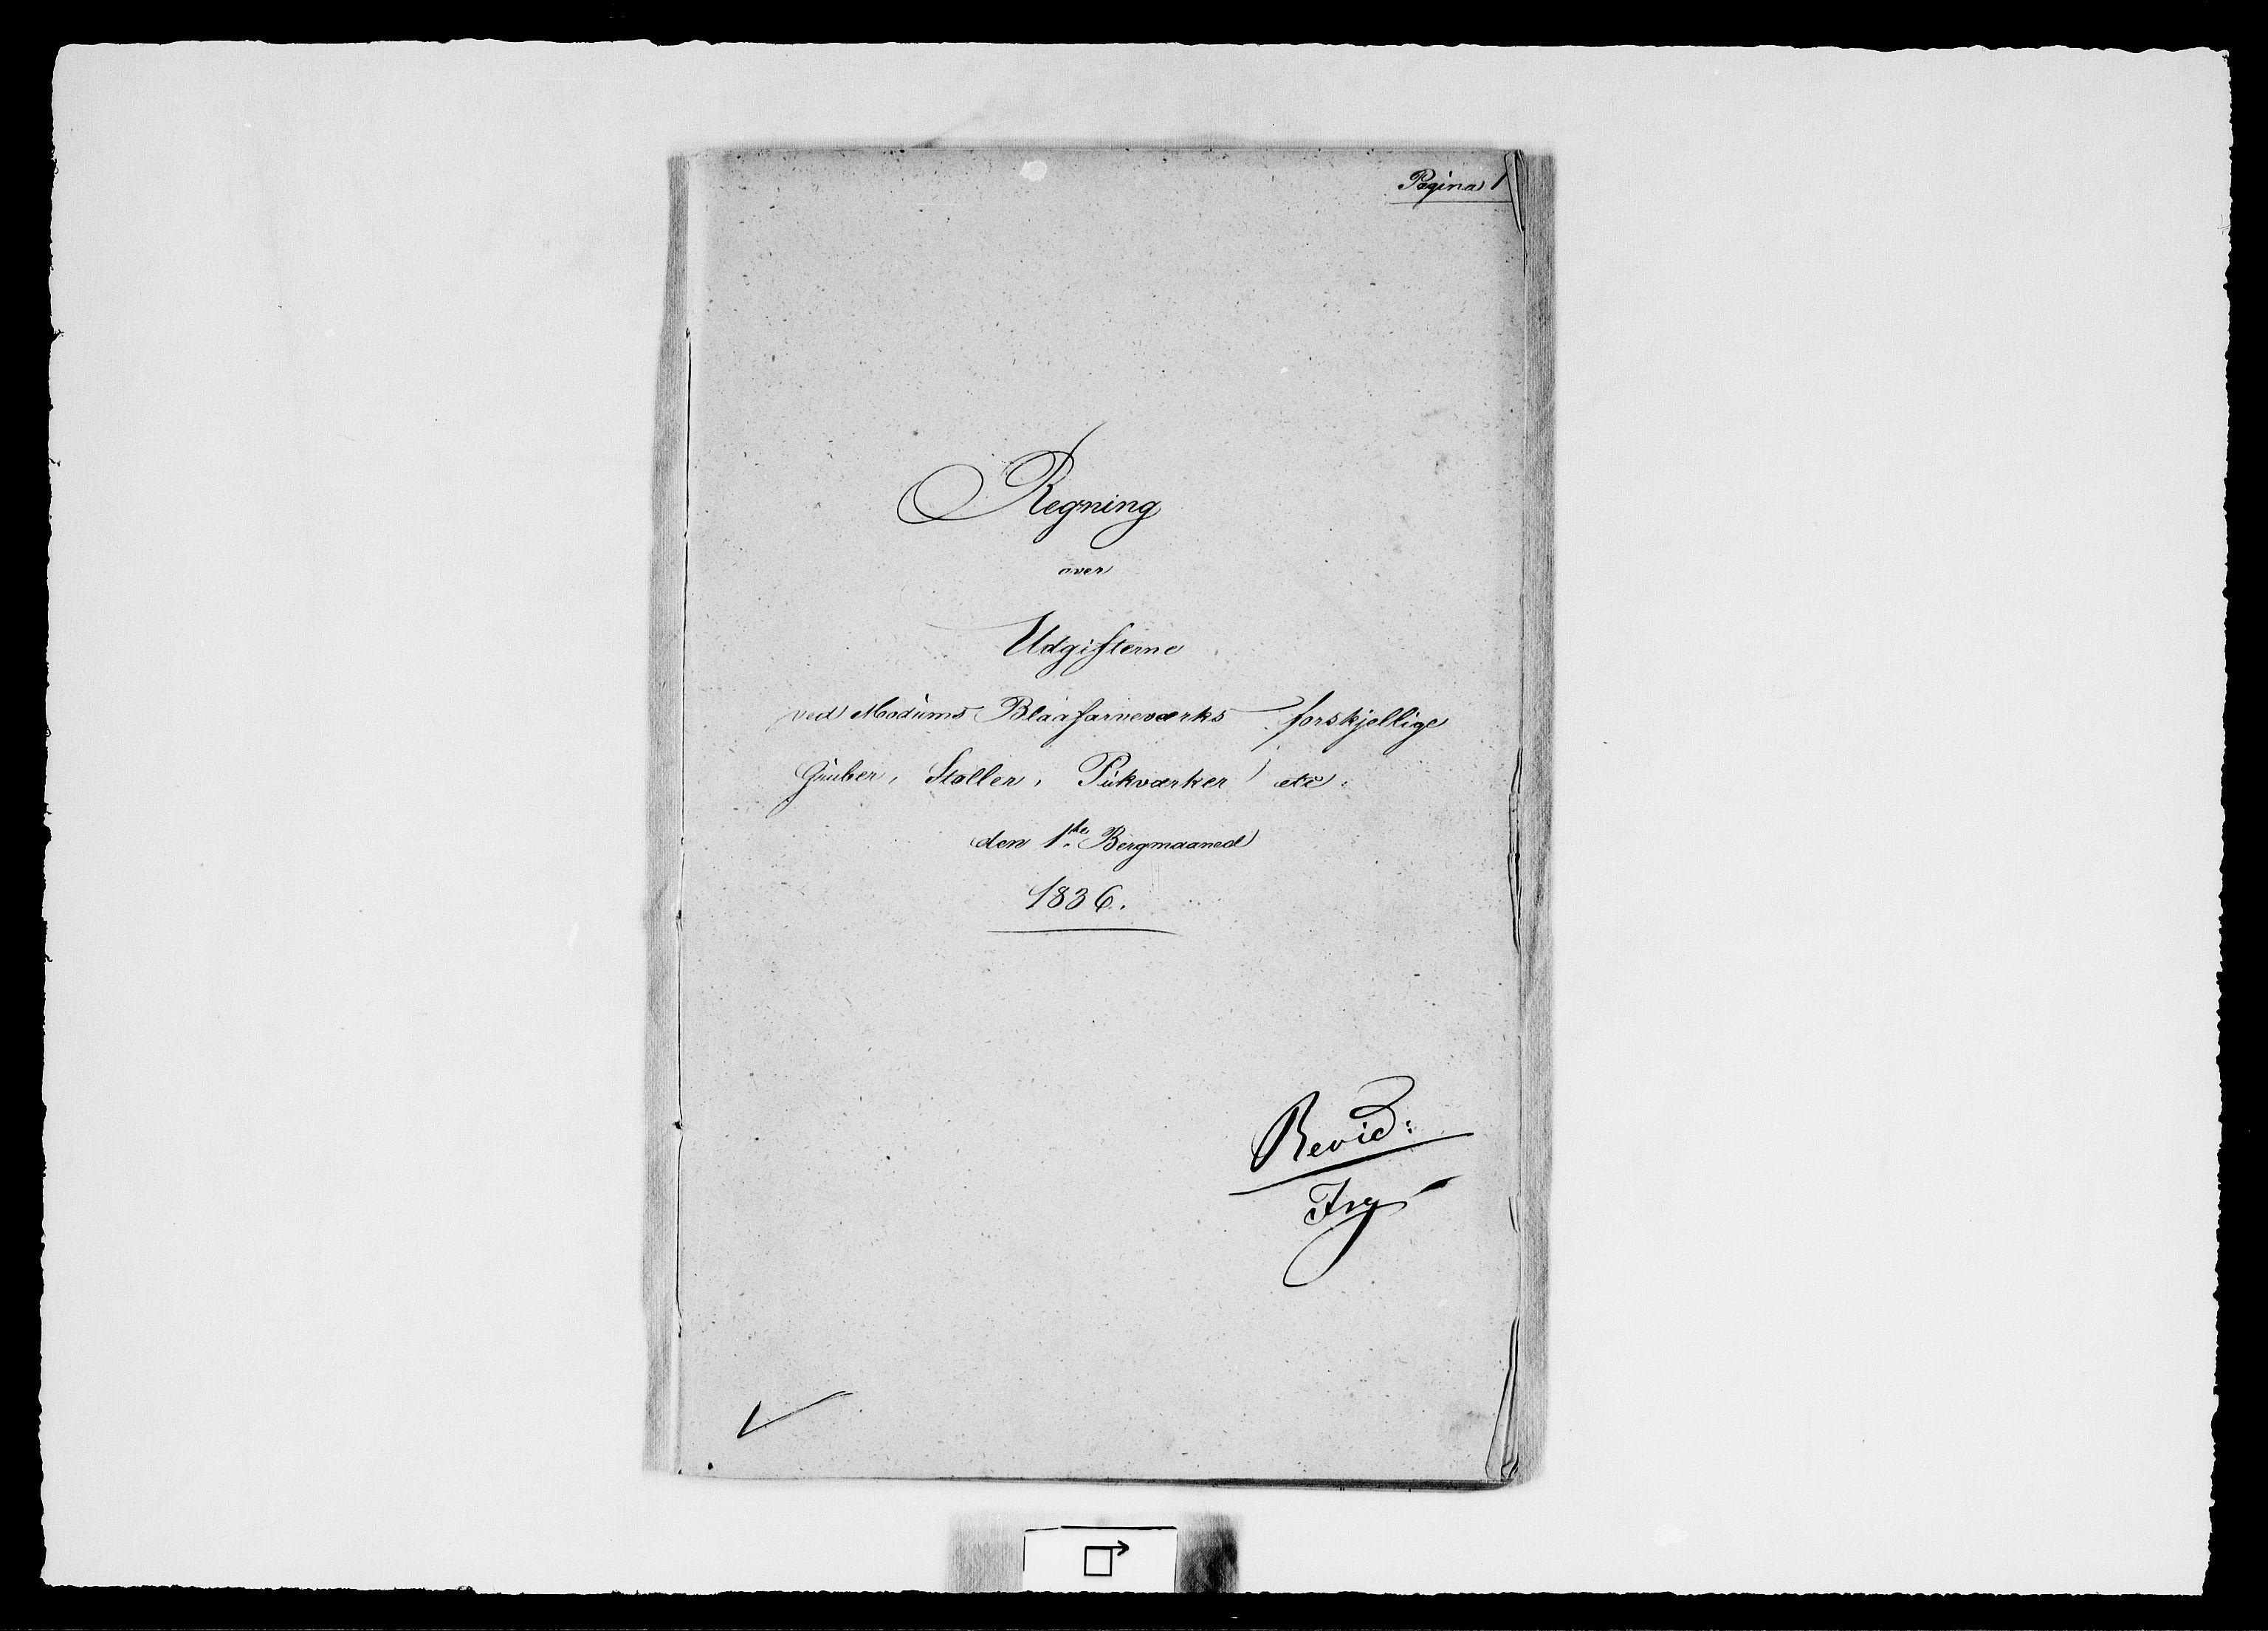 RA, Modums Blaafarveværk, G/Gd/Gdd/L0262, 1836, s. 2